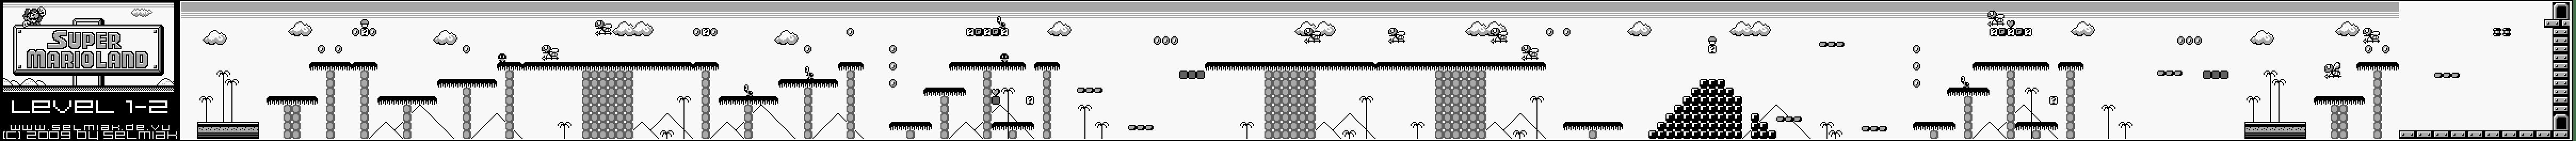 Super Mario Land Level 1 2 Map Walkthrough Gameboy Gb